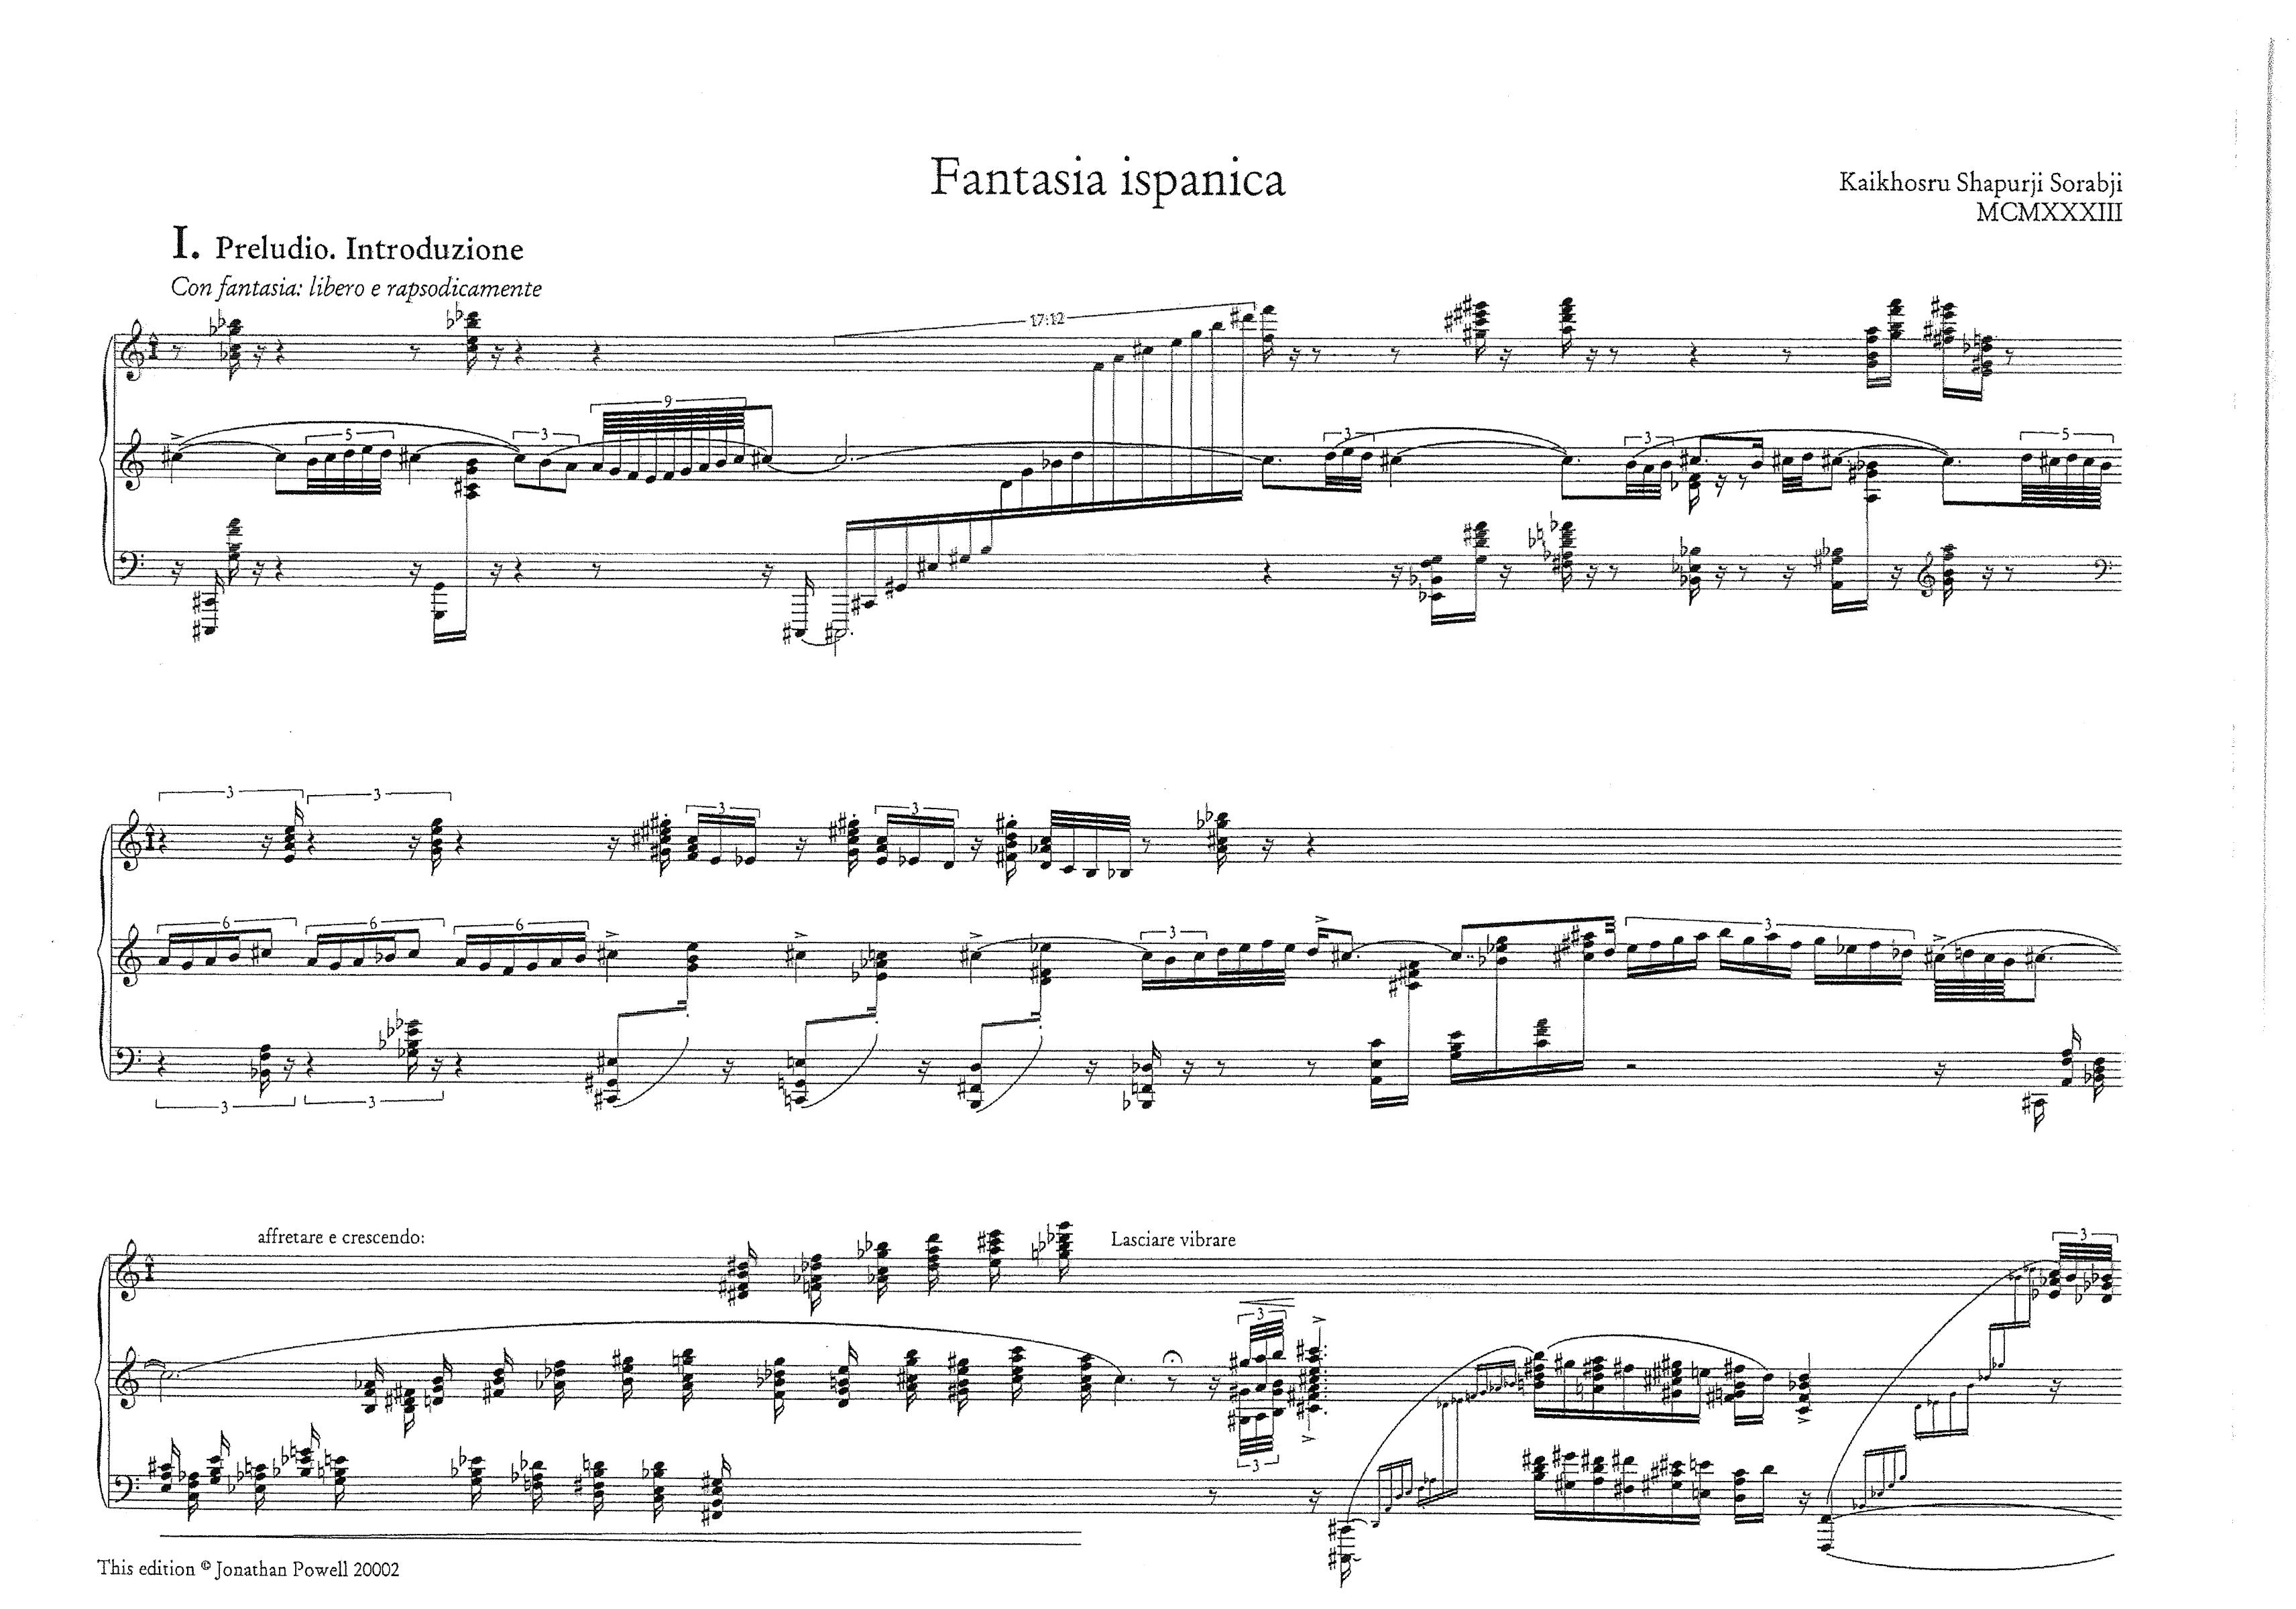 The Sorabji Archive — Compositions — KSS55 Fantasia Ispanica